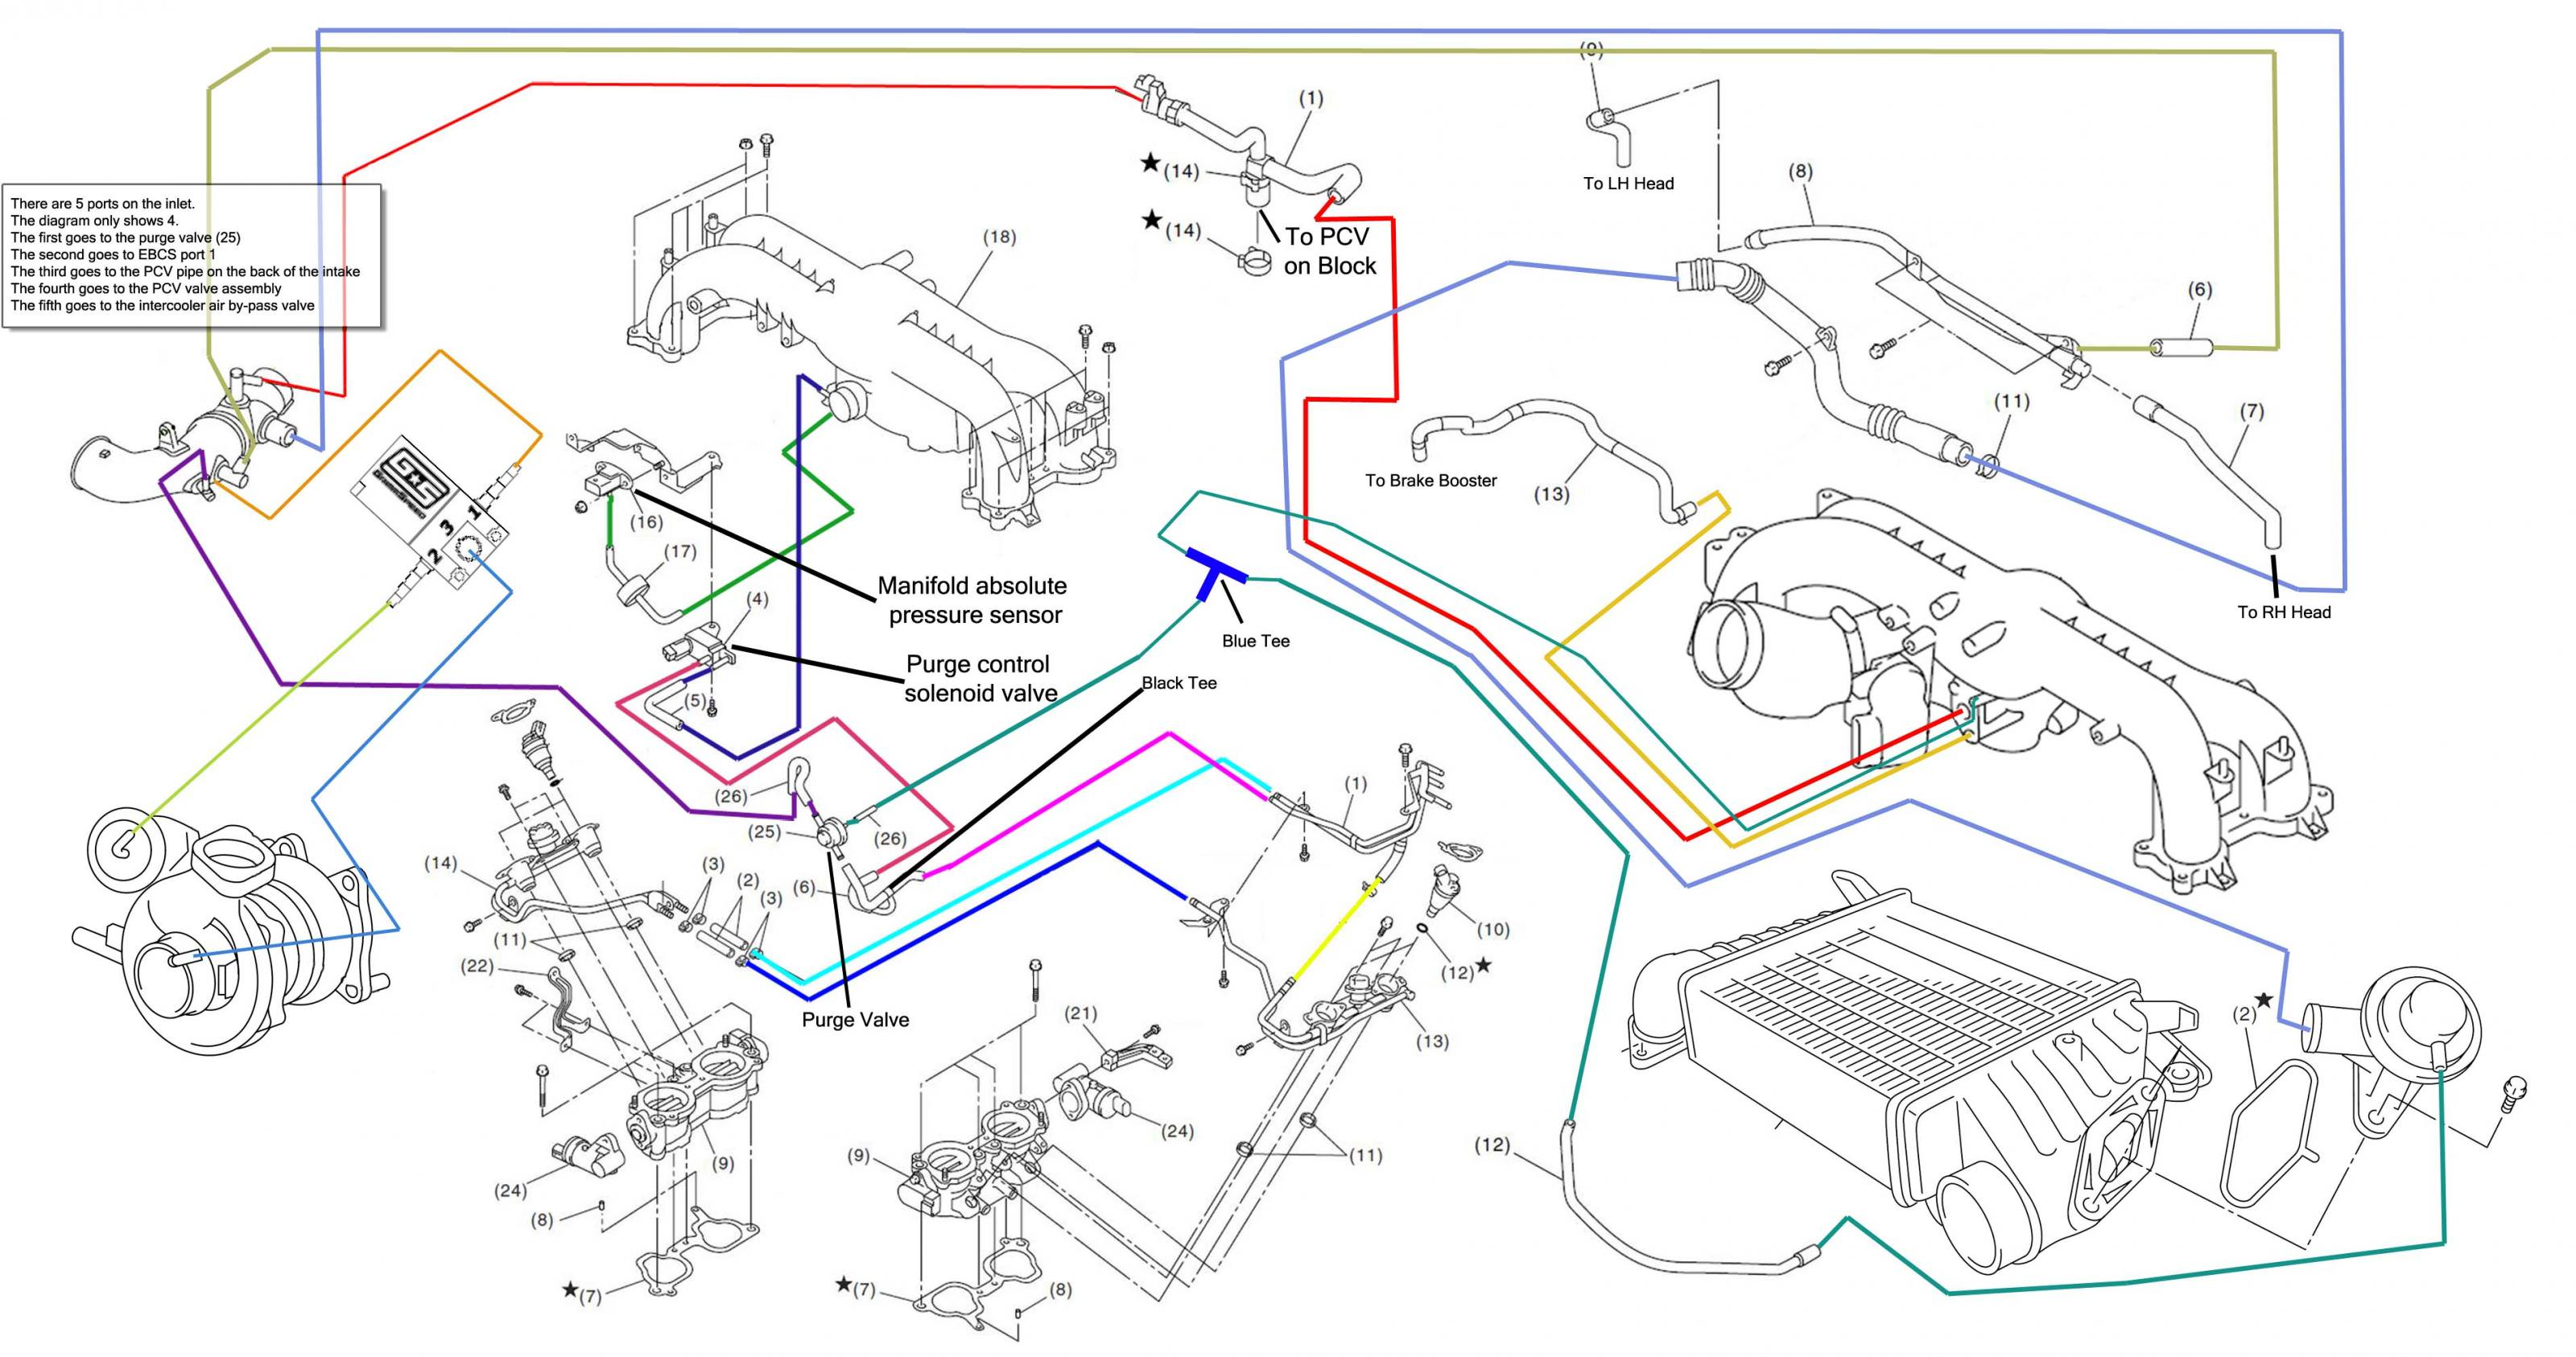 [WLLP_2054]   OV_4693] Subaru Outback Vacuum Lines Diagram Also Subaru Outback Engine  Diagram Free Diagram | 2004 Subaru Outback Engine Diagram |  | Habi Ifica Opein Cran Mimig Embo Xeira Vira Mohammedshrine Librar Wiring 101